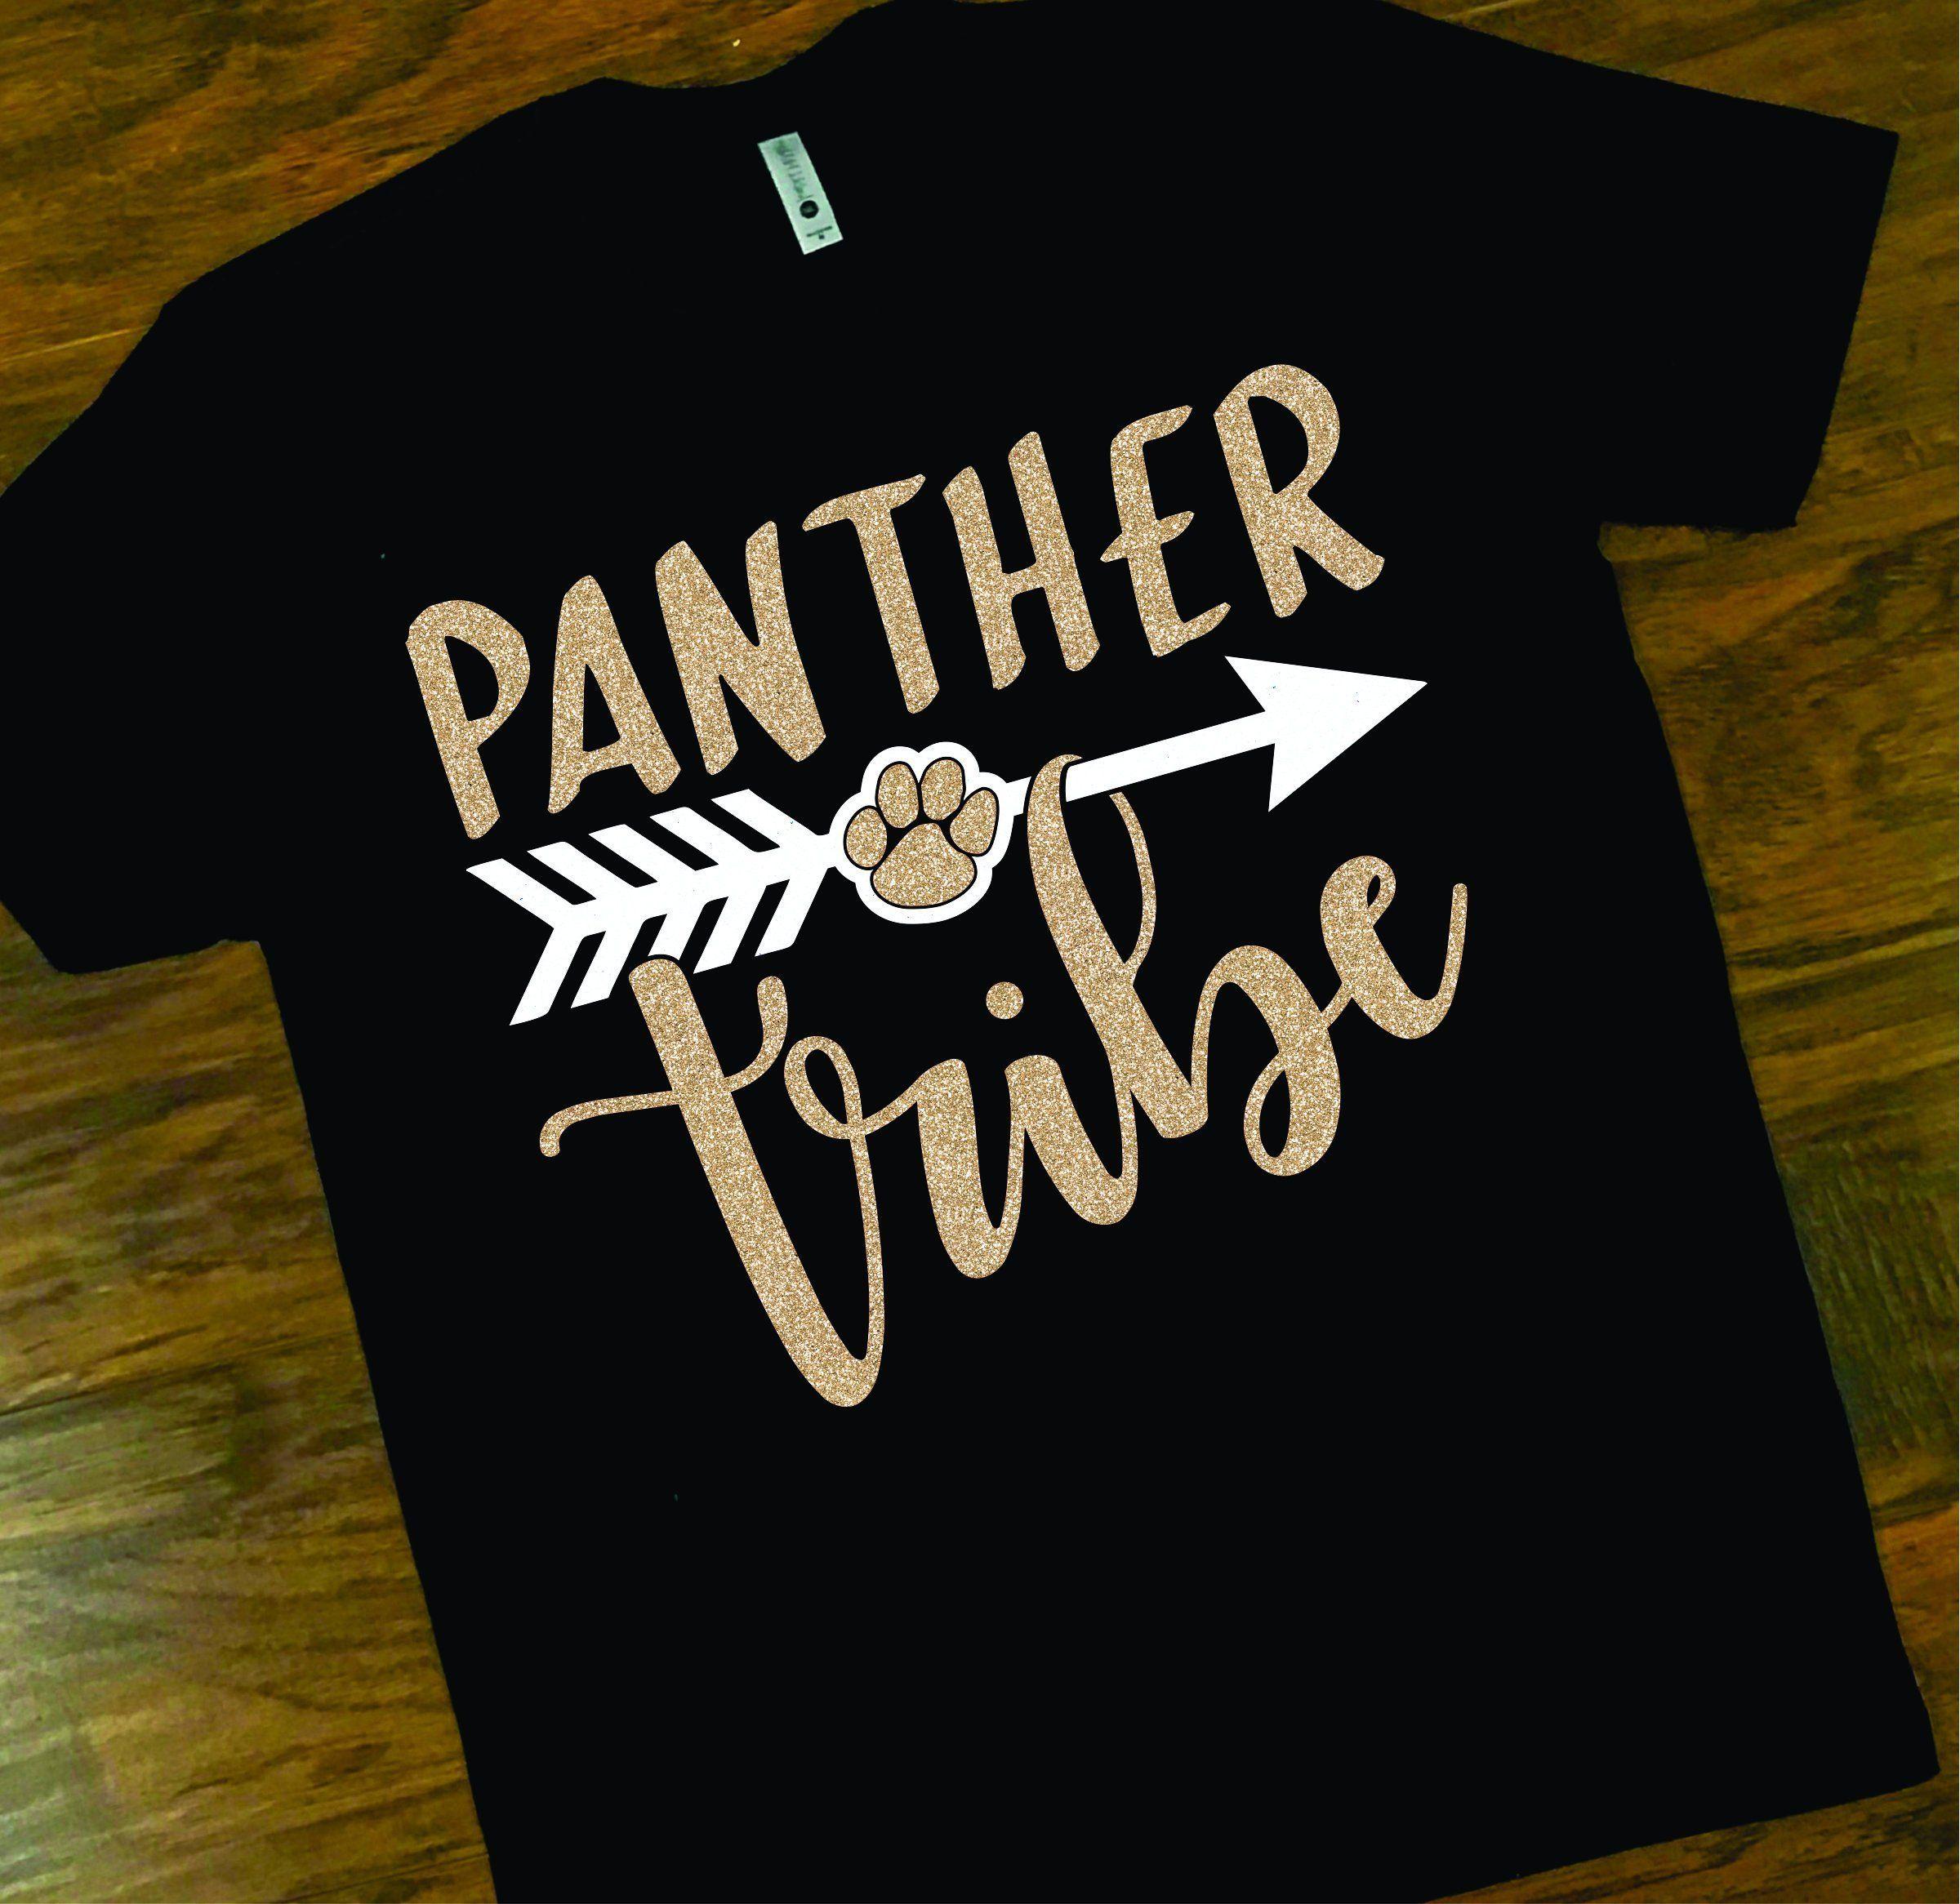 0743fe43 School Spirit Panther Tee, Panther Tribe Glitter Tee, Panther School Tee,  Custom Glitter School Spirit T-Shirt by shopMKD on Etsy